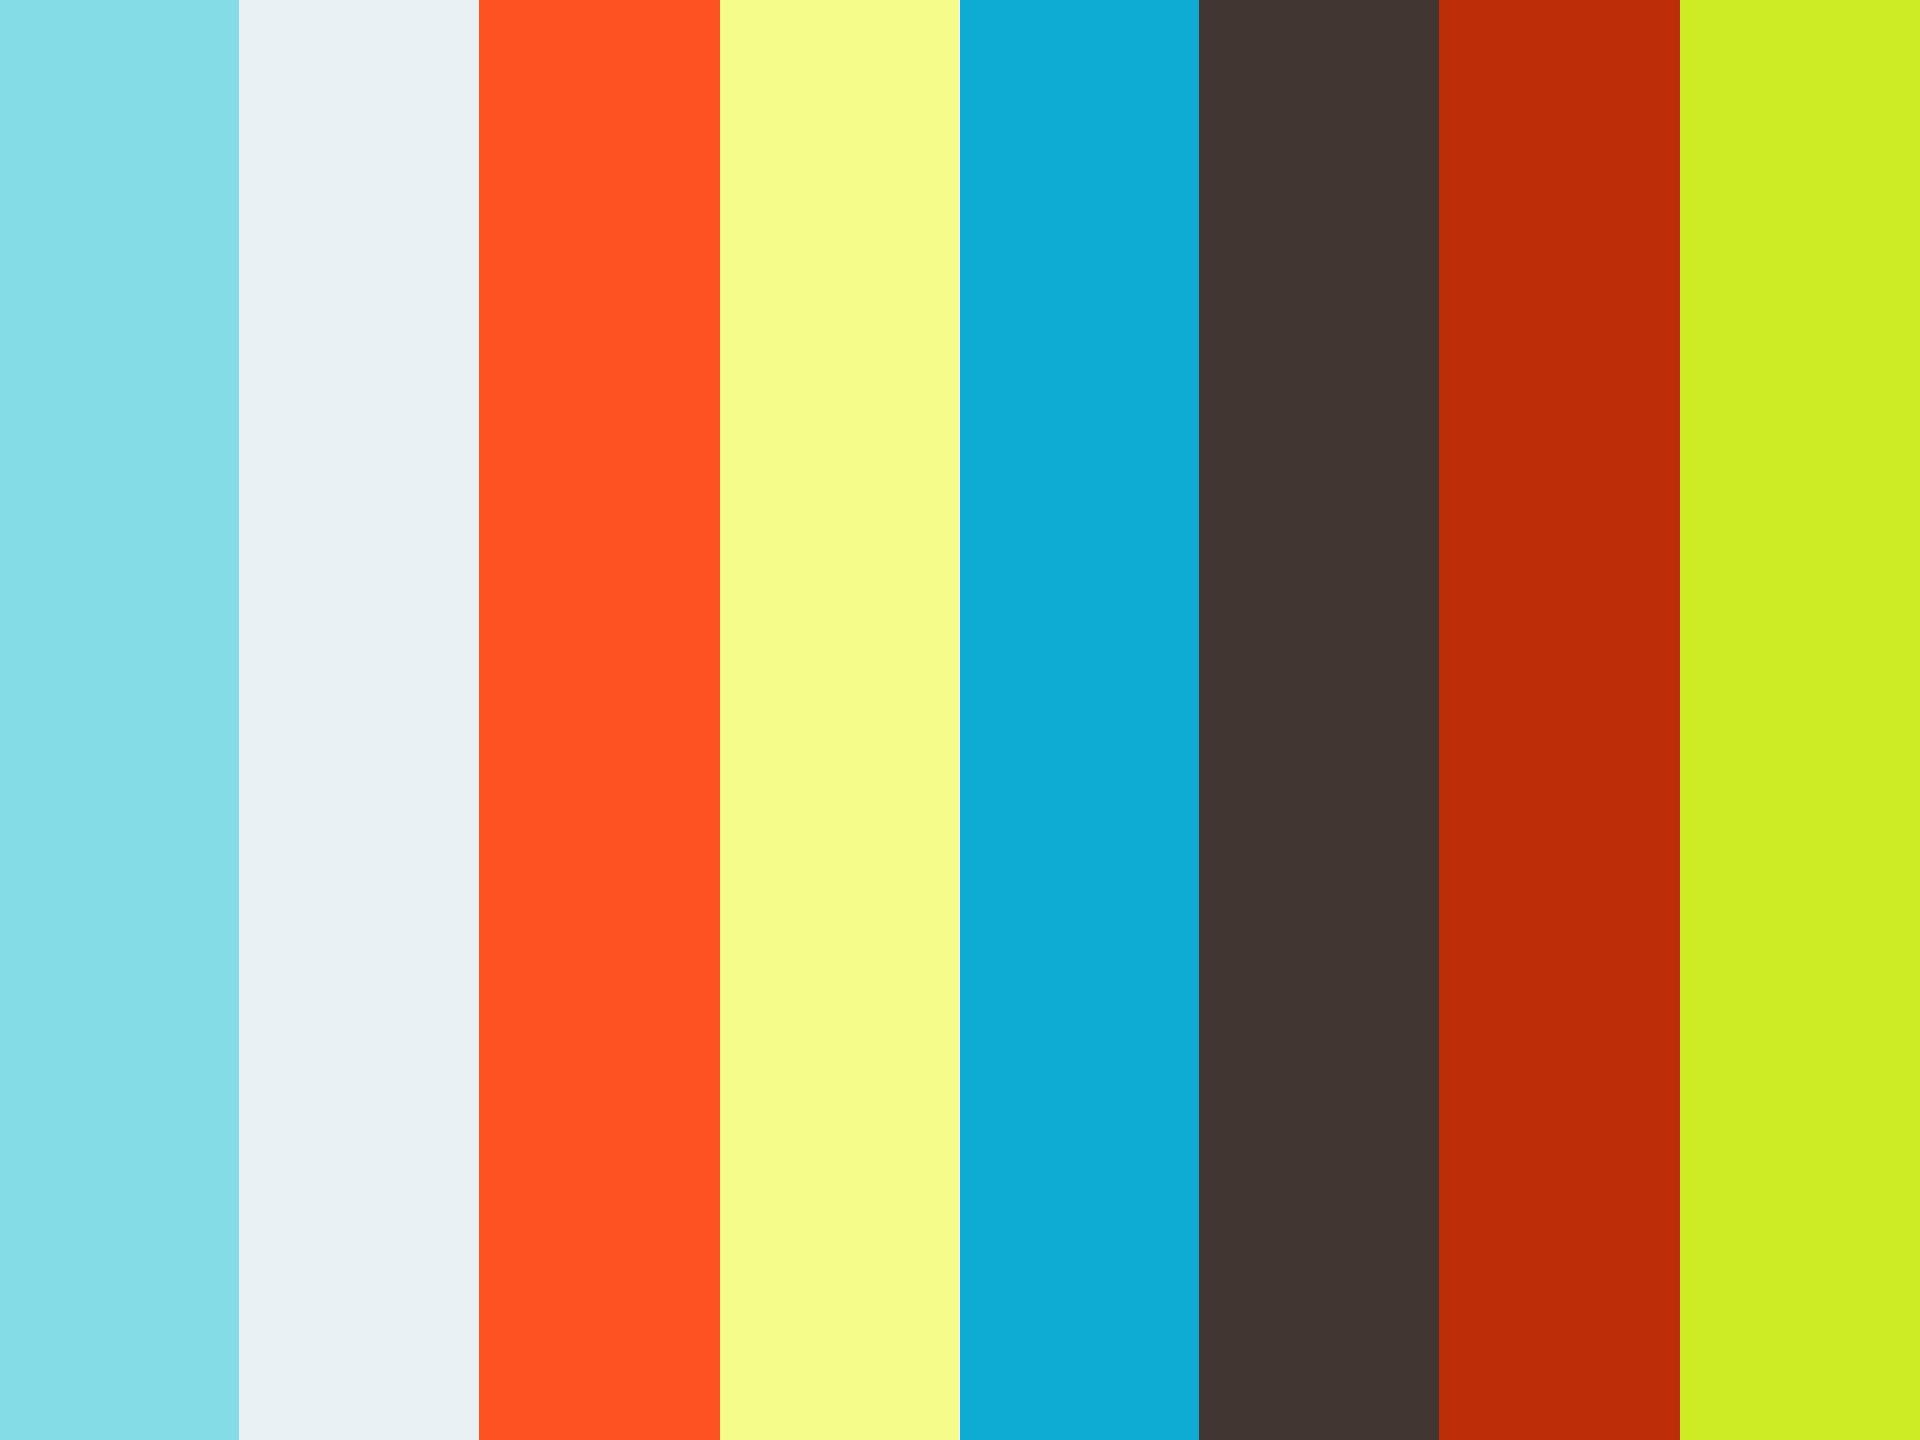 Overlay?src0=https%3a%2f%2fi.vimeocdn.com%2fvideo%2f484648272 1280x720.jpg&src1=https%3a%2f%2ff.vimeocdn.com%2fimages v6%2fshare%2fplay icon overlay